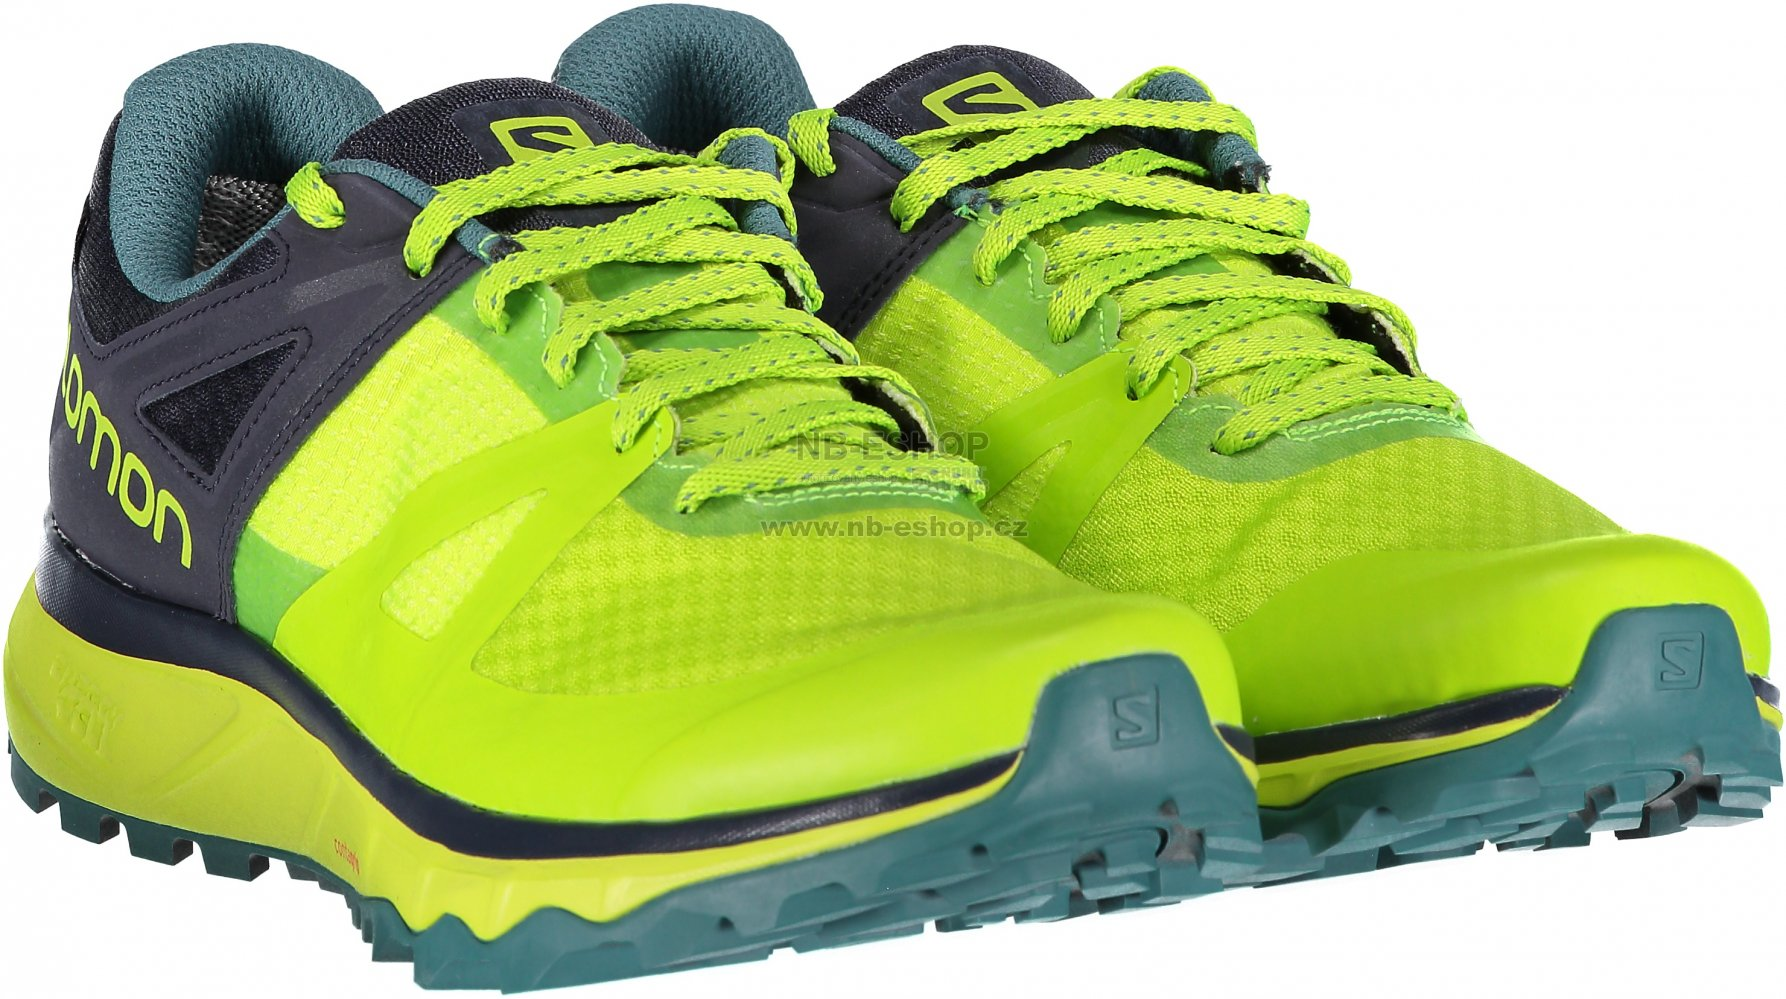 Pánské běžecké boty SALOMON TRAILSTER GTX L40612000 ACID LIME GRAPHITE HYDRO . 107852c89c